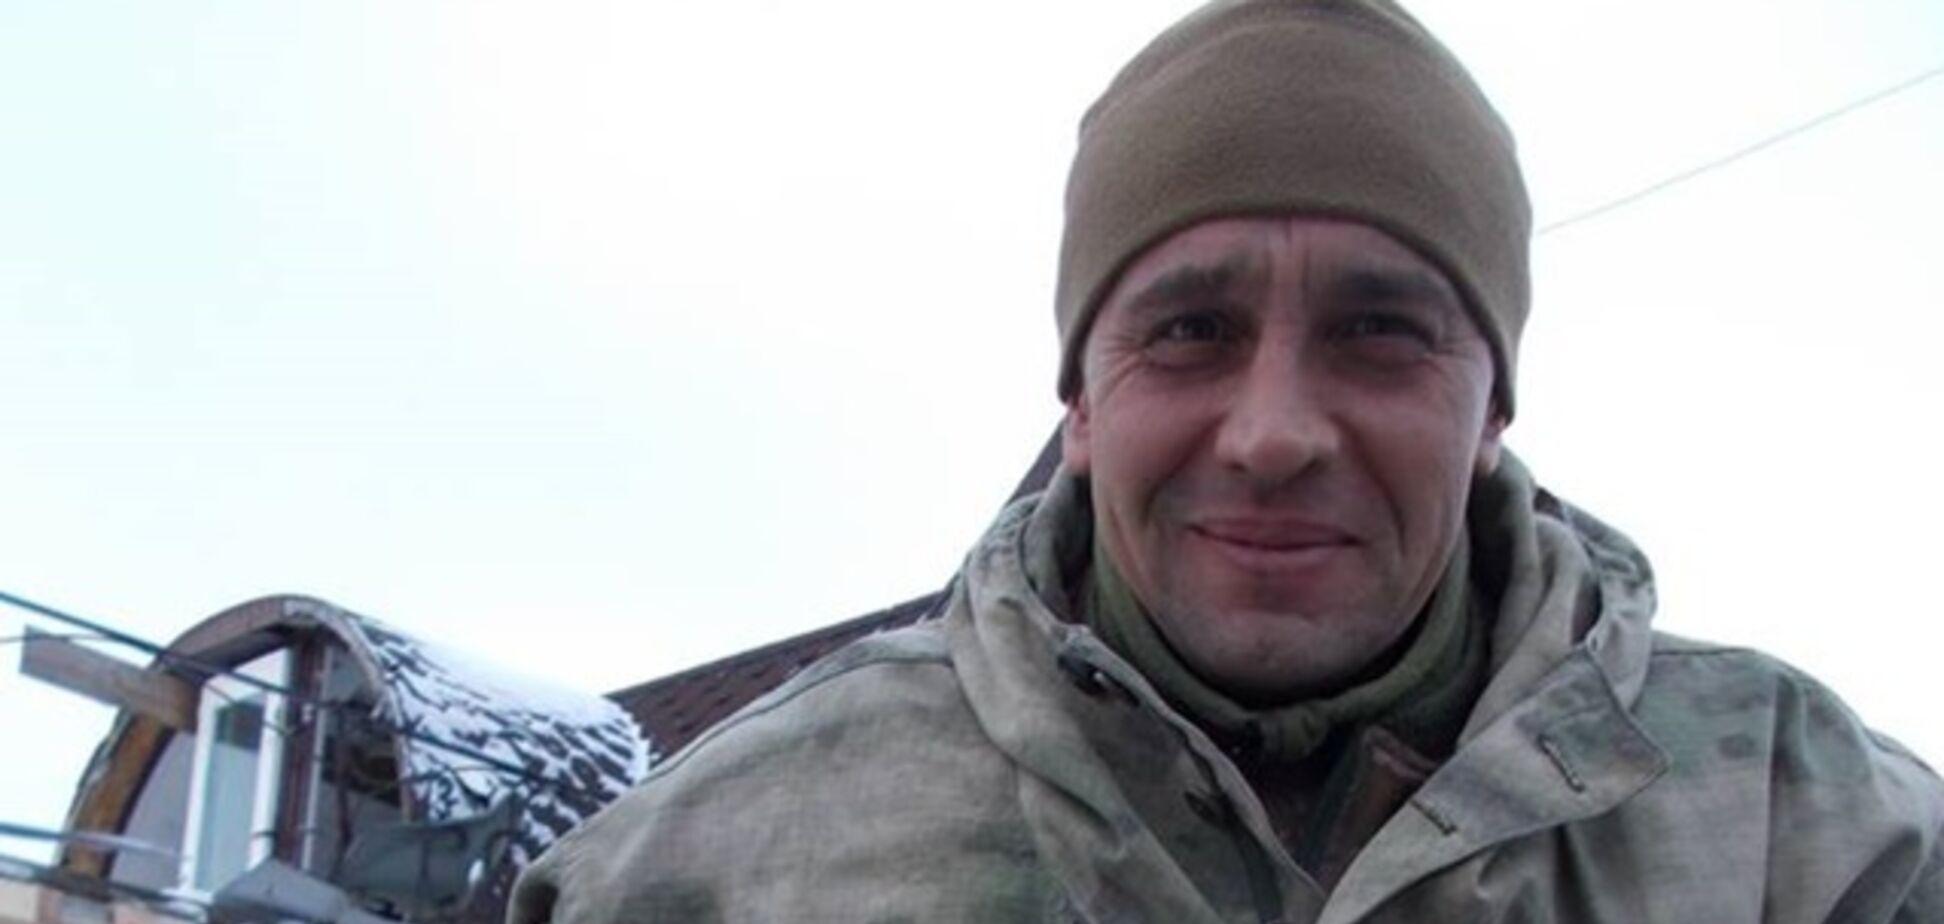 На Донбассе трагически погиб командир разведчиков: фото героя